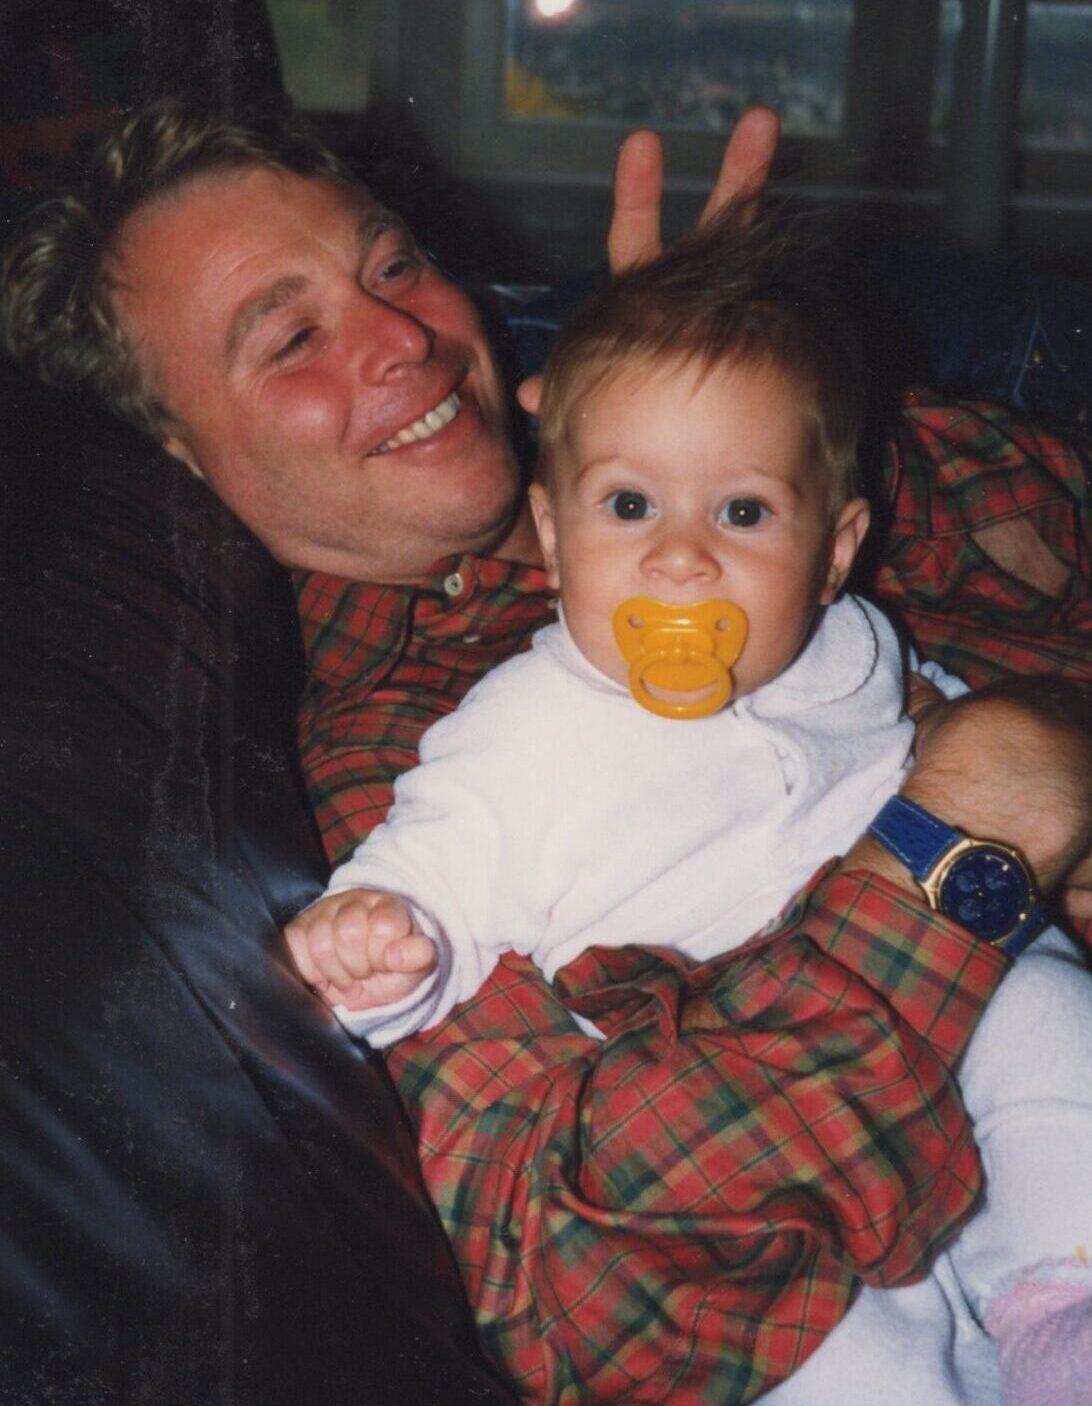 Babyfoto Maxime und Urs Mezger